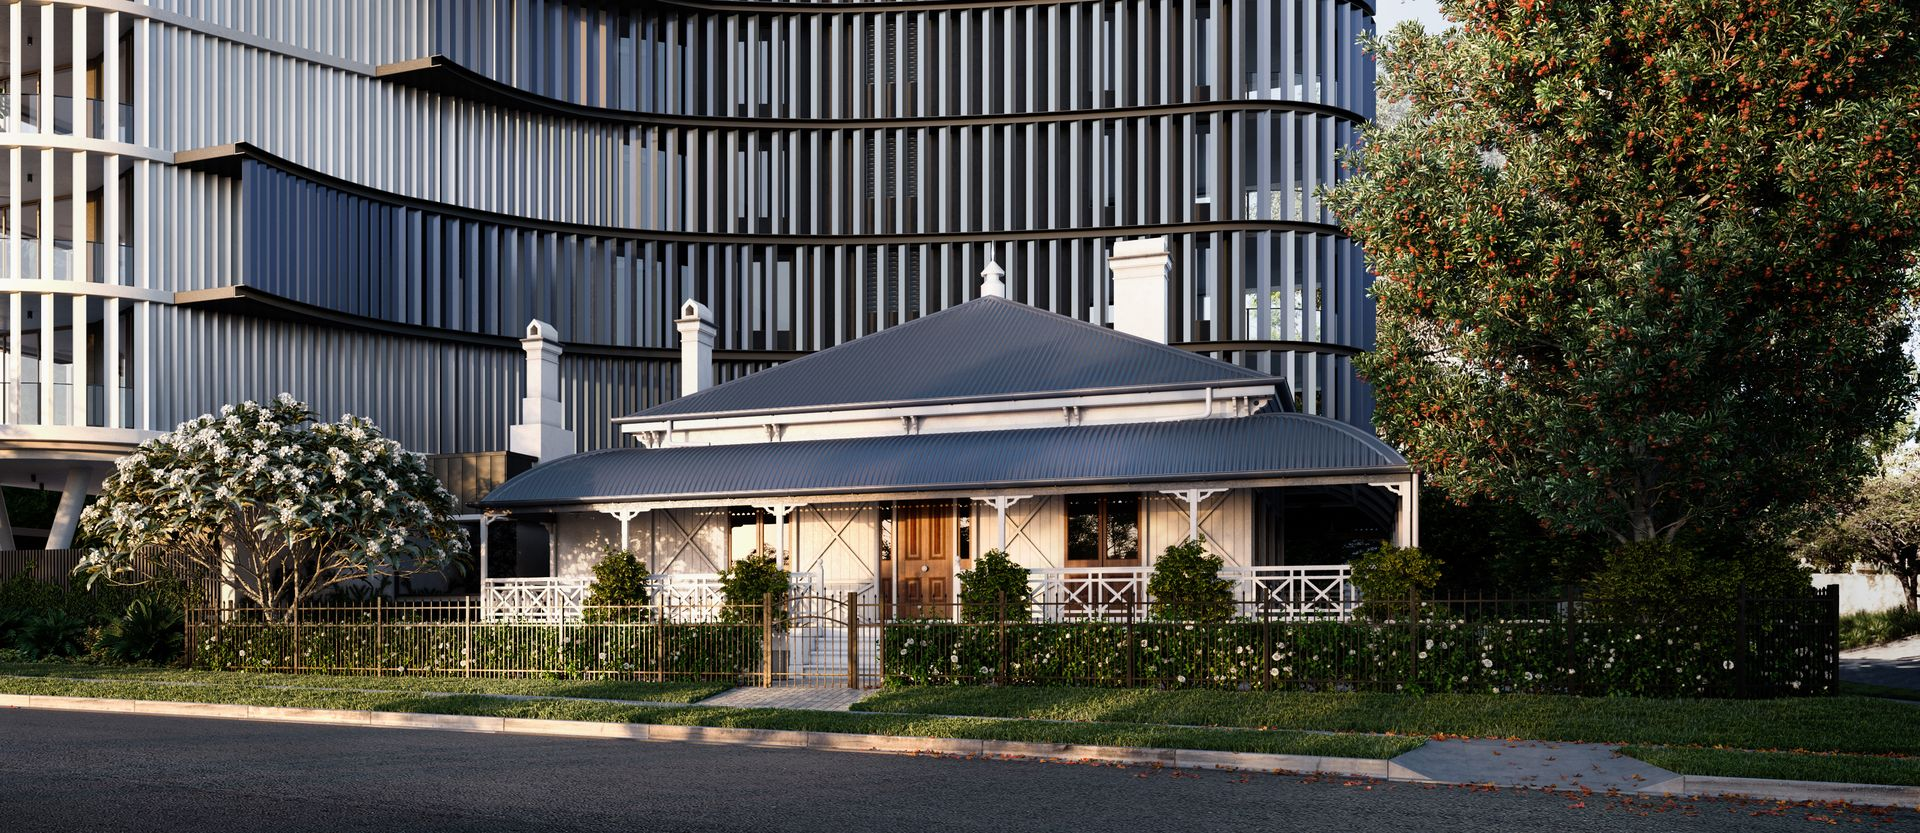 162 Lambert Street, Kangaroo Point QLD 4169, Image 0